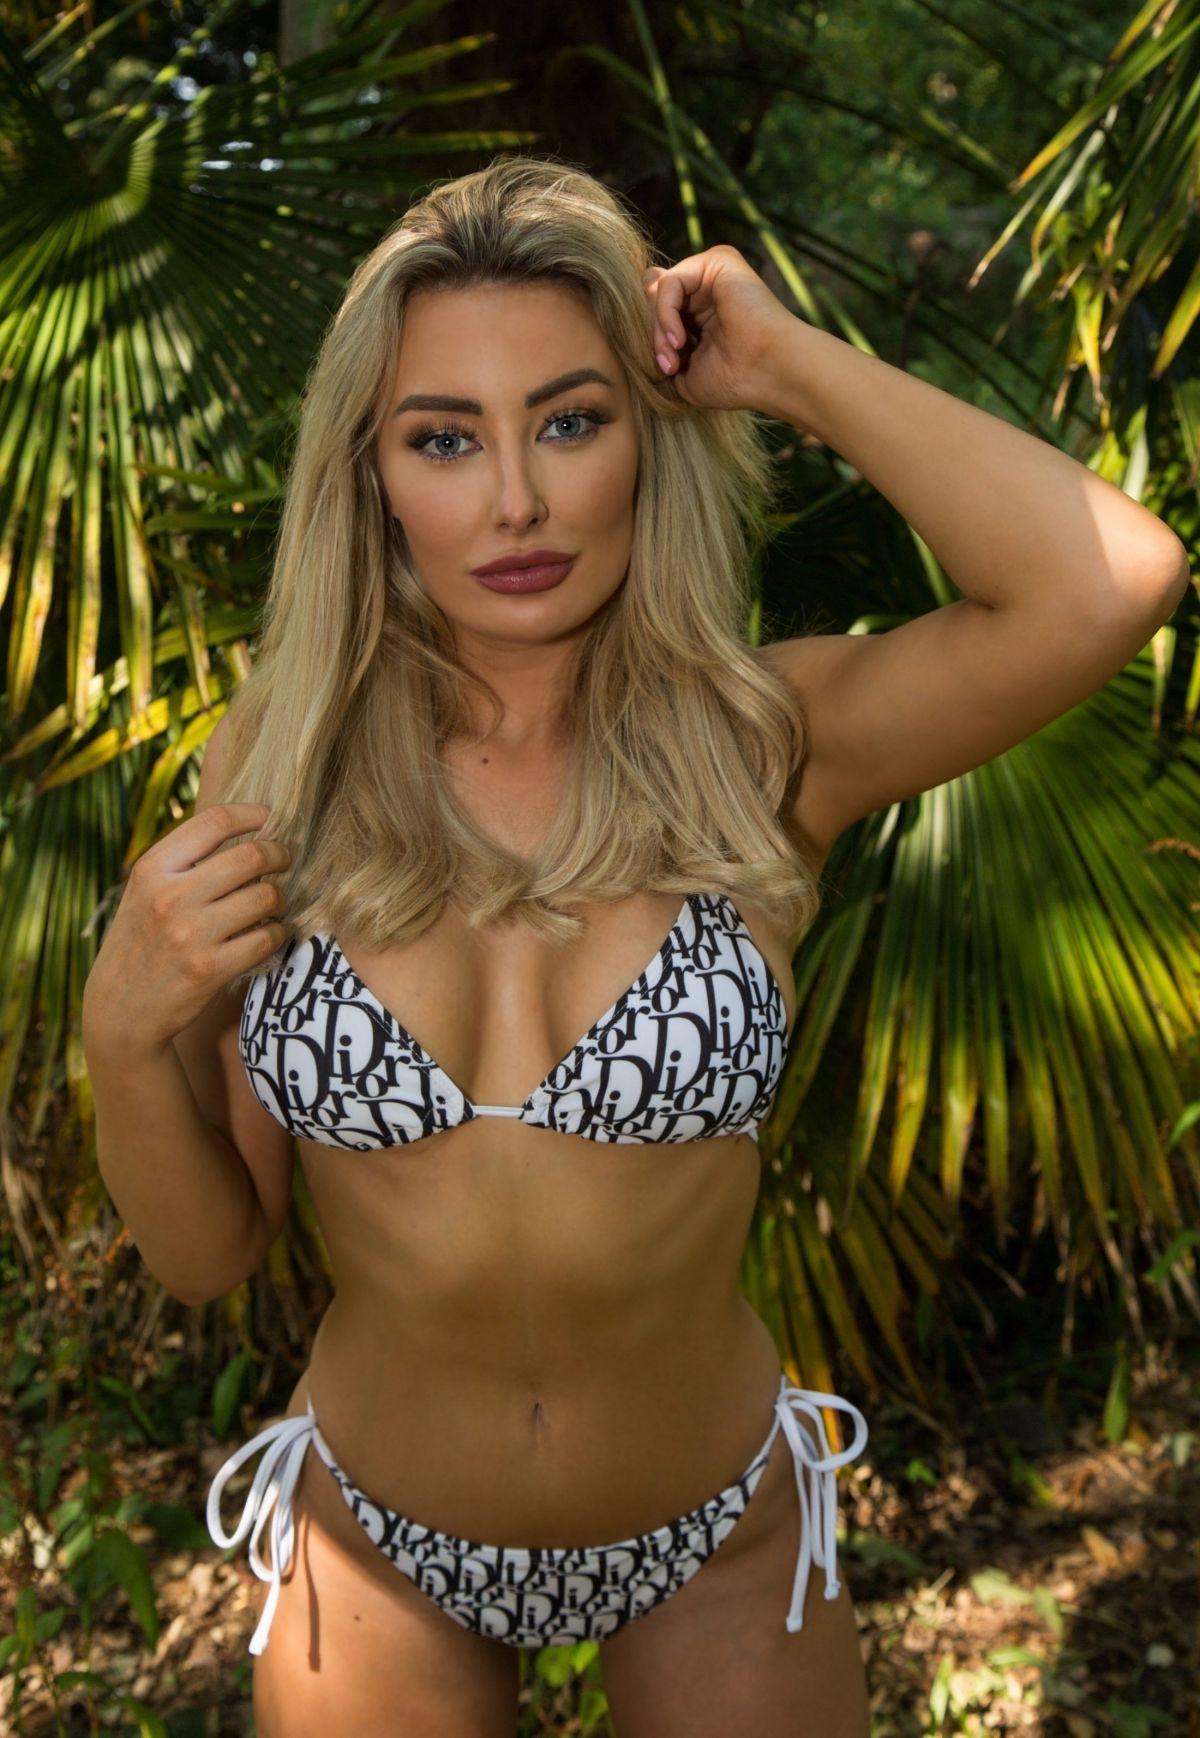 Chloe Crowhurst Bikini Photoshoot Out Brentwood